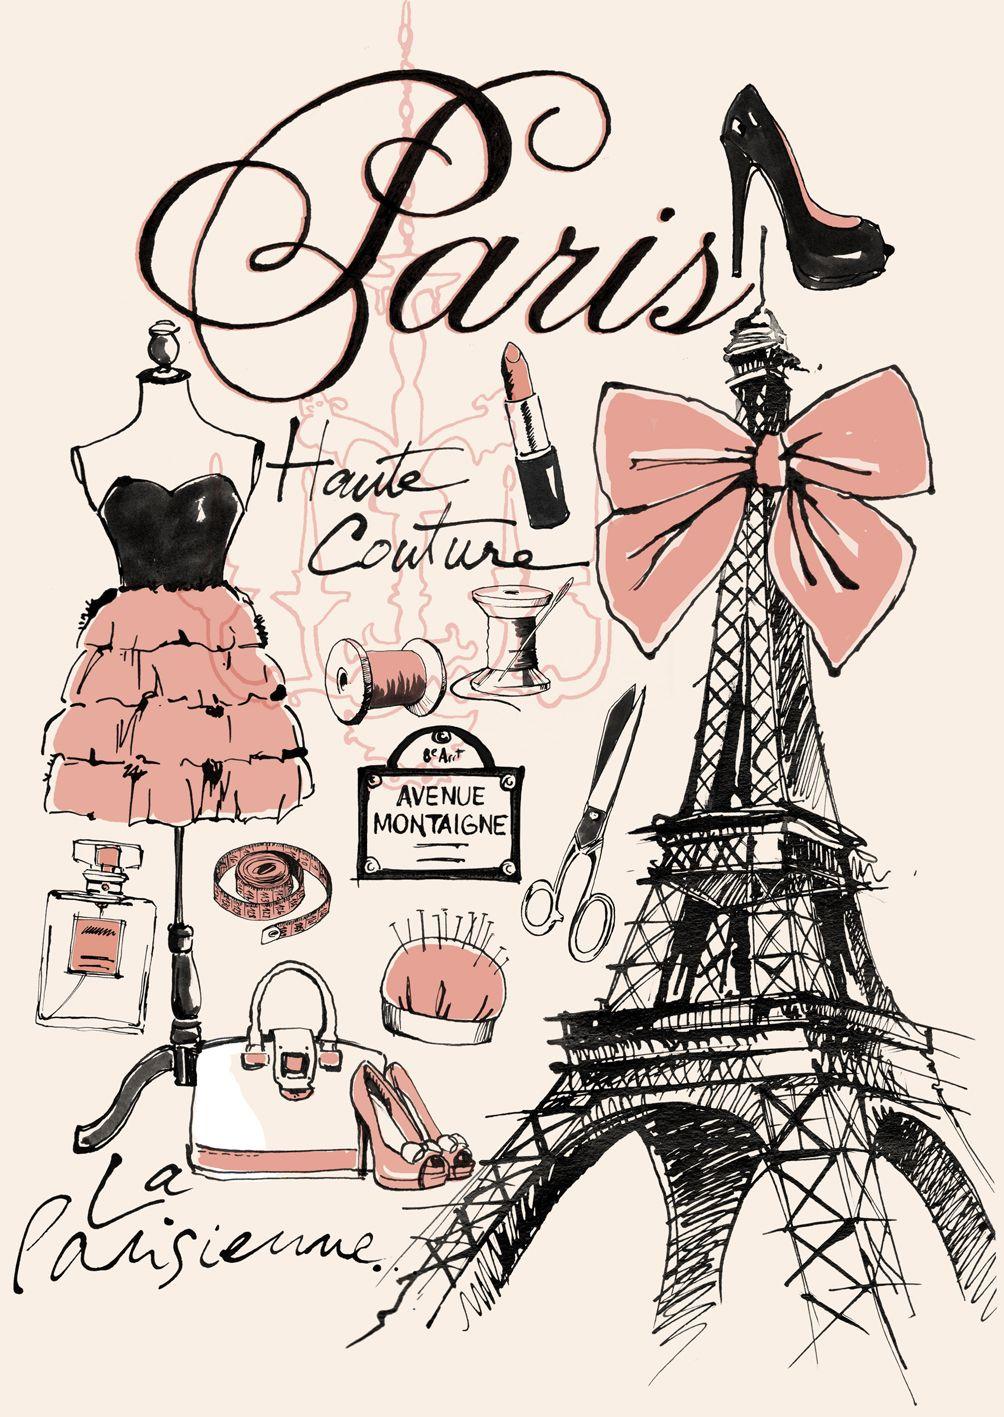 Pin by Dawn Searles on Paris | Paris wallpaper, Paris illustration, Paris art